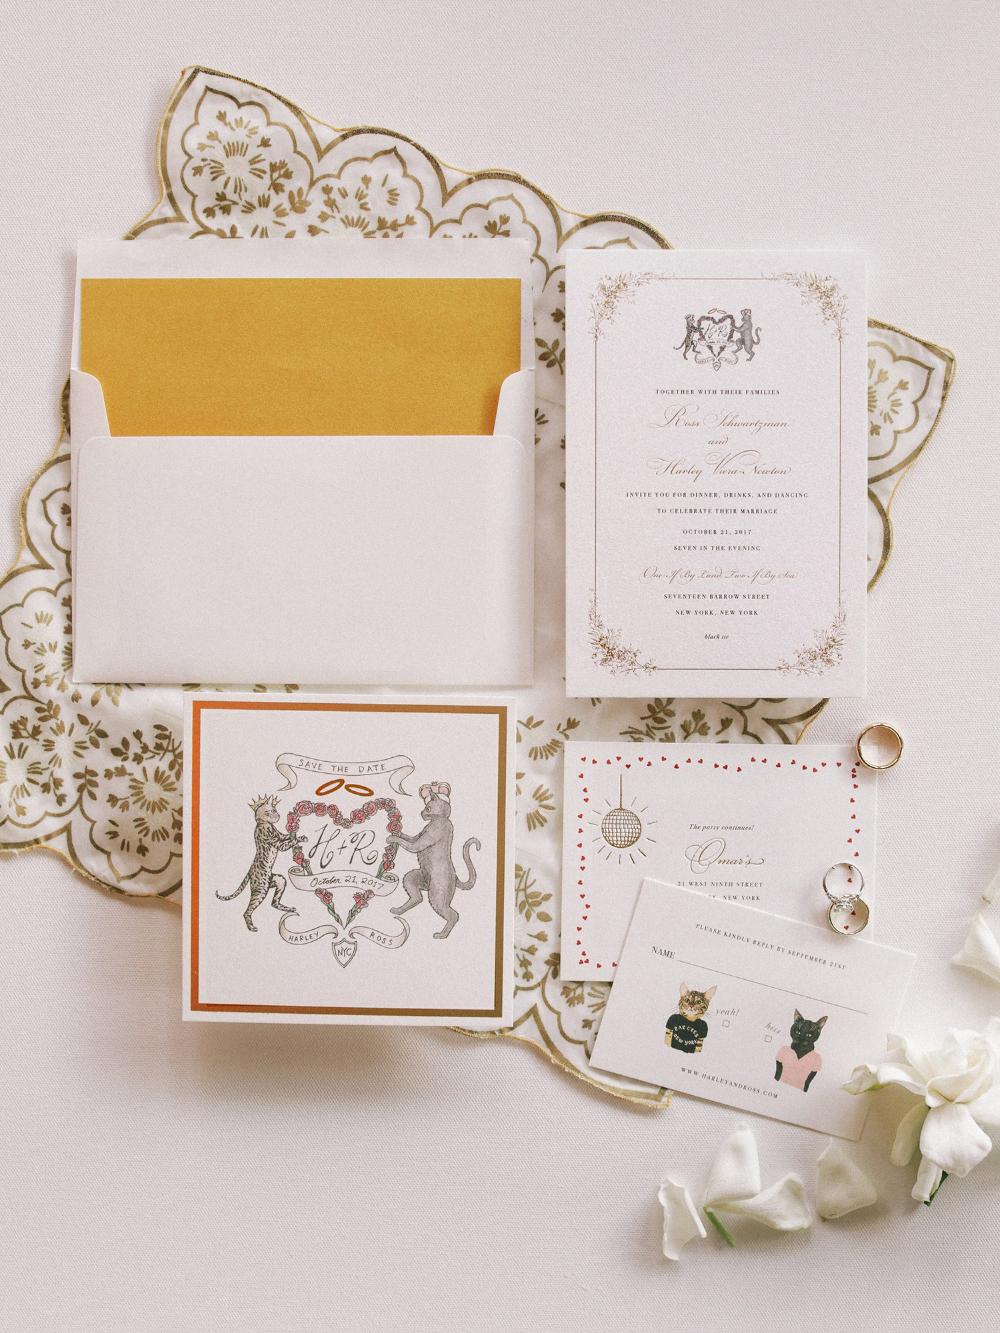 Inside Hong Kong Based It Girl Feiping Chang S Elaborate Wedding Extravaganza In Capri Affordable Wedding Invitations New York Wedding Valentines Day Weddings